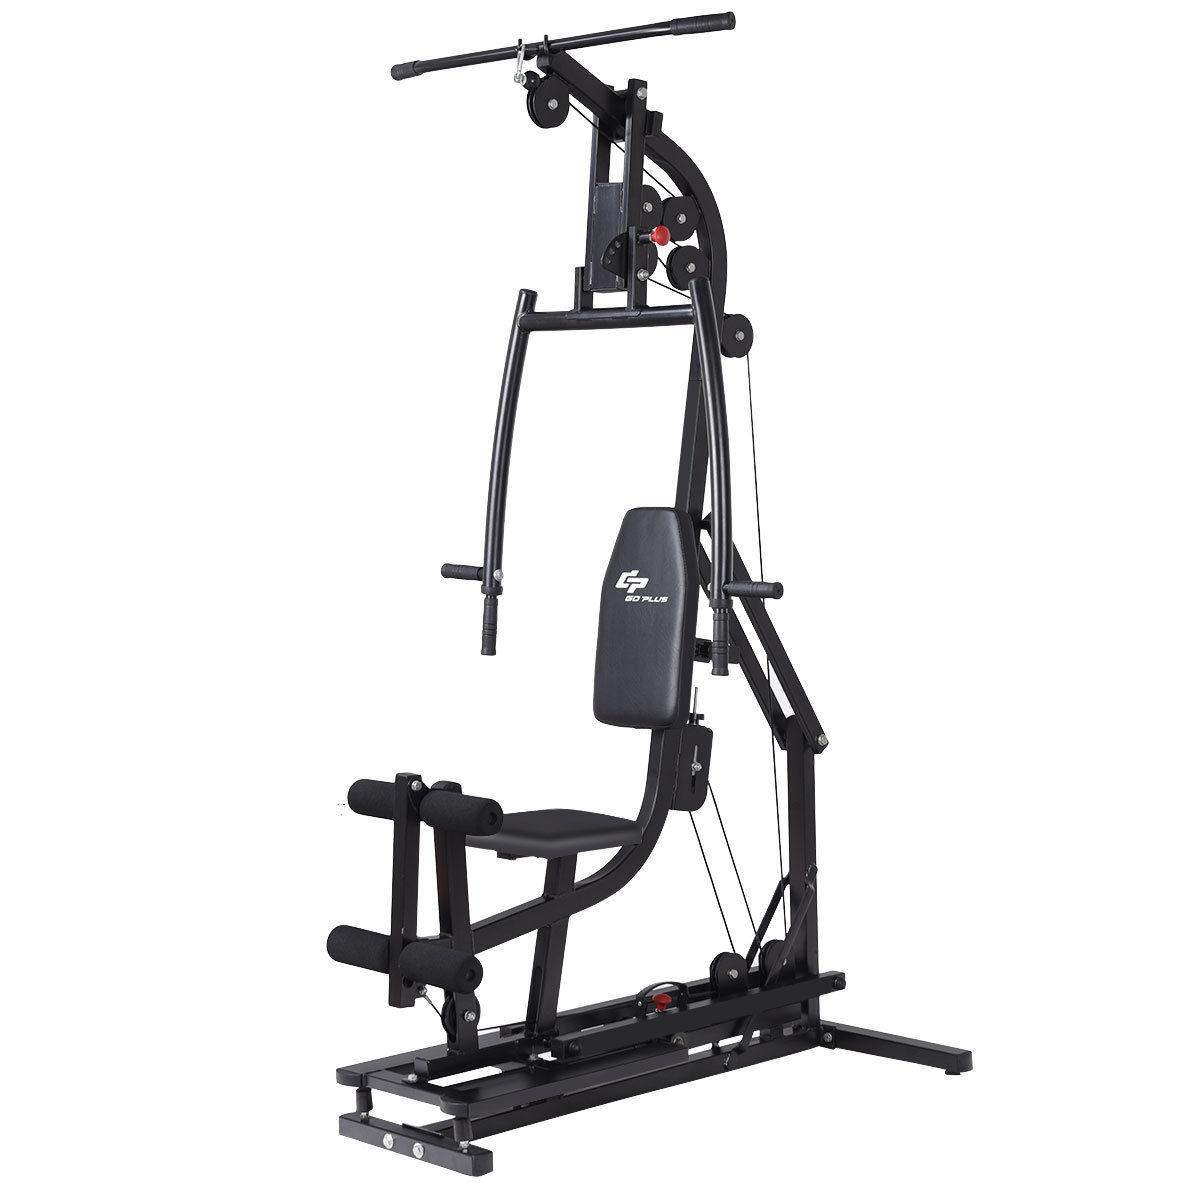 Goplus Multifunctional Home Gym Station Workout Machine Total Body Training Steel